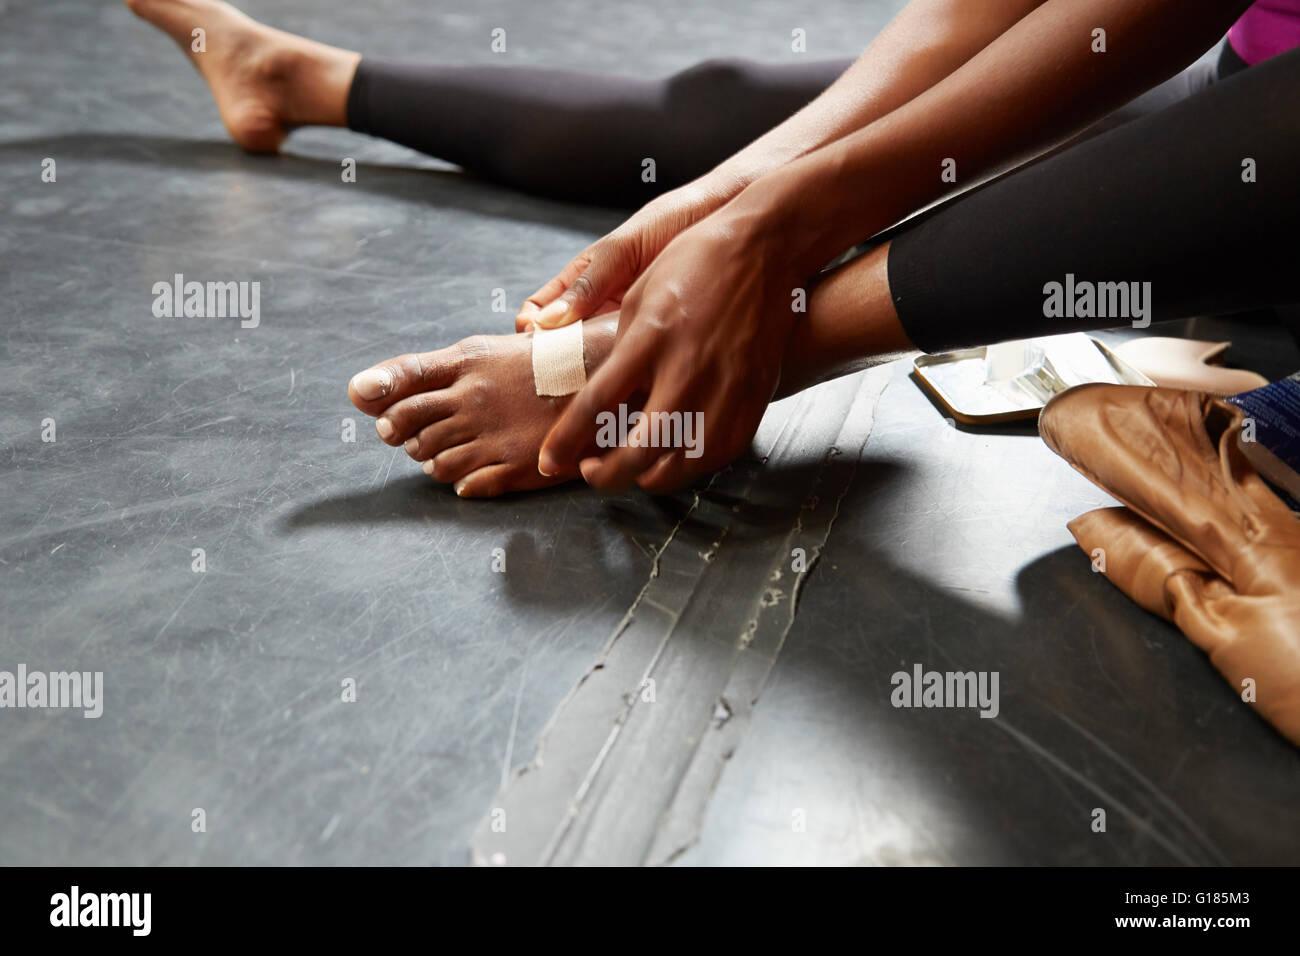 Ballet dancer putting on plaster on foot - Stock Image